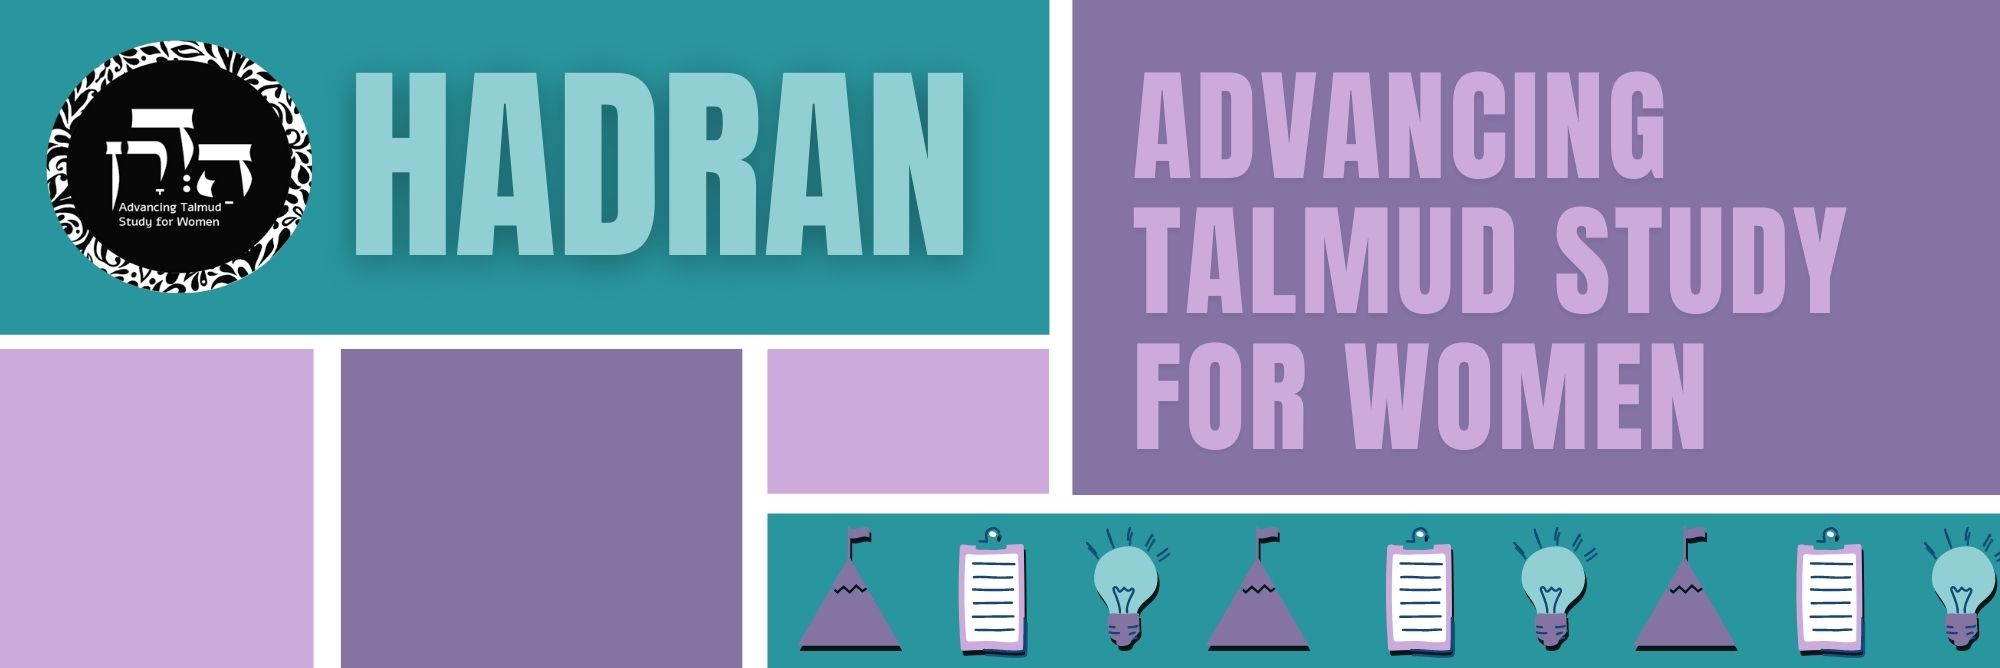 Hadran - advancing talmud study for women